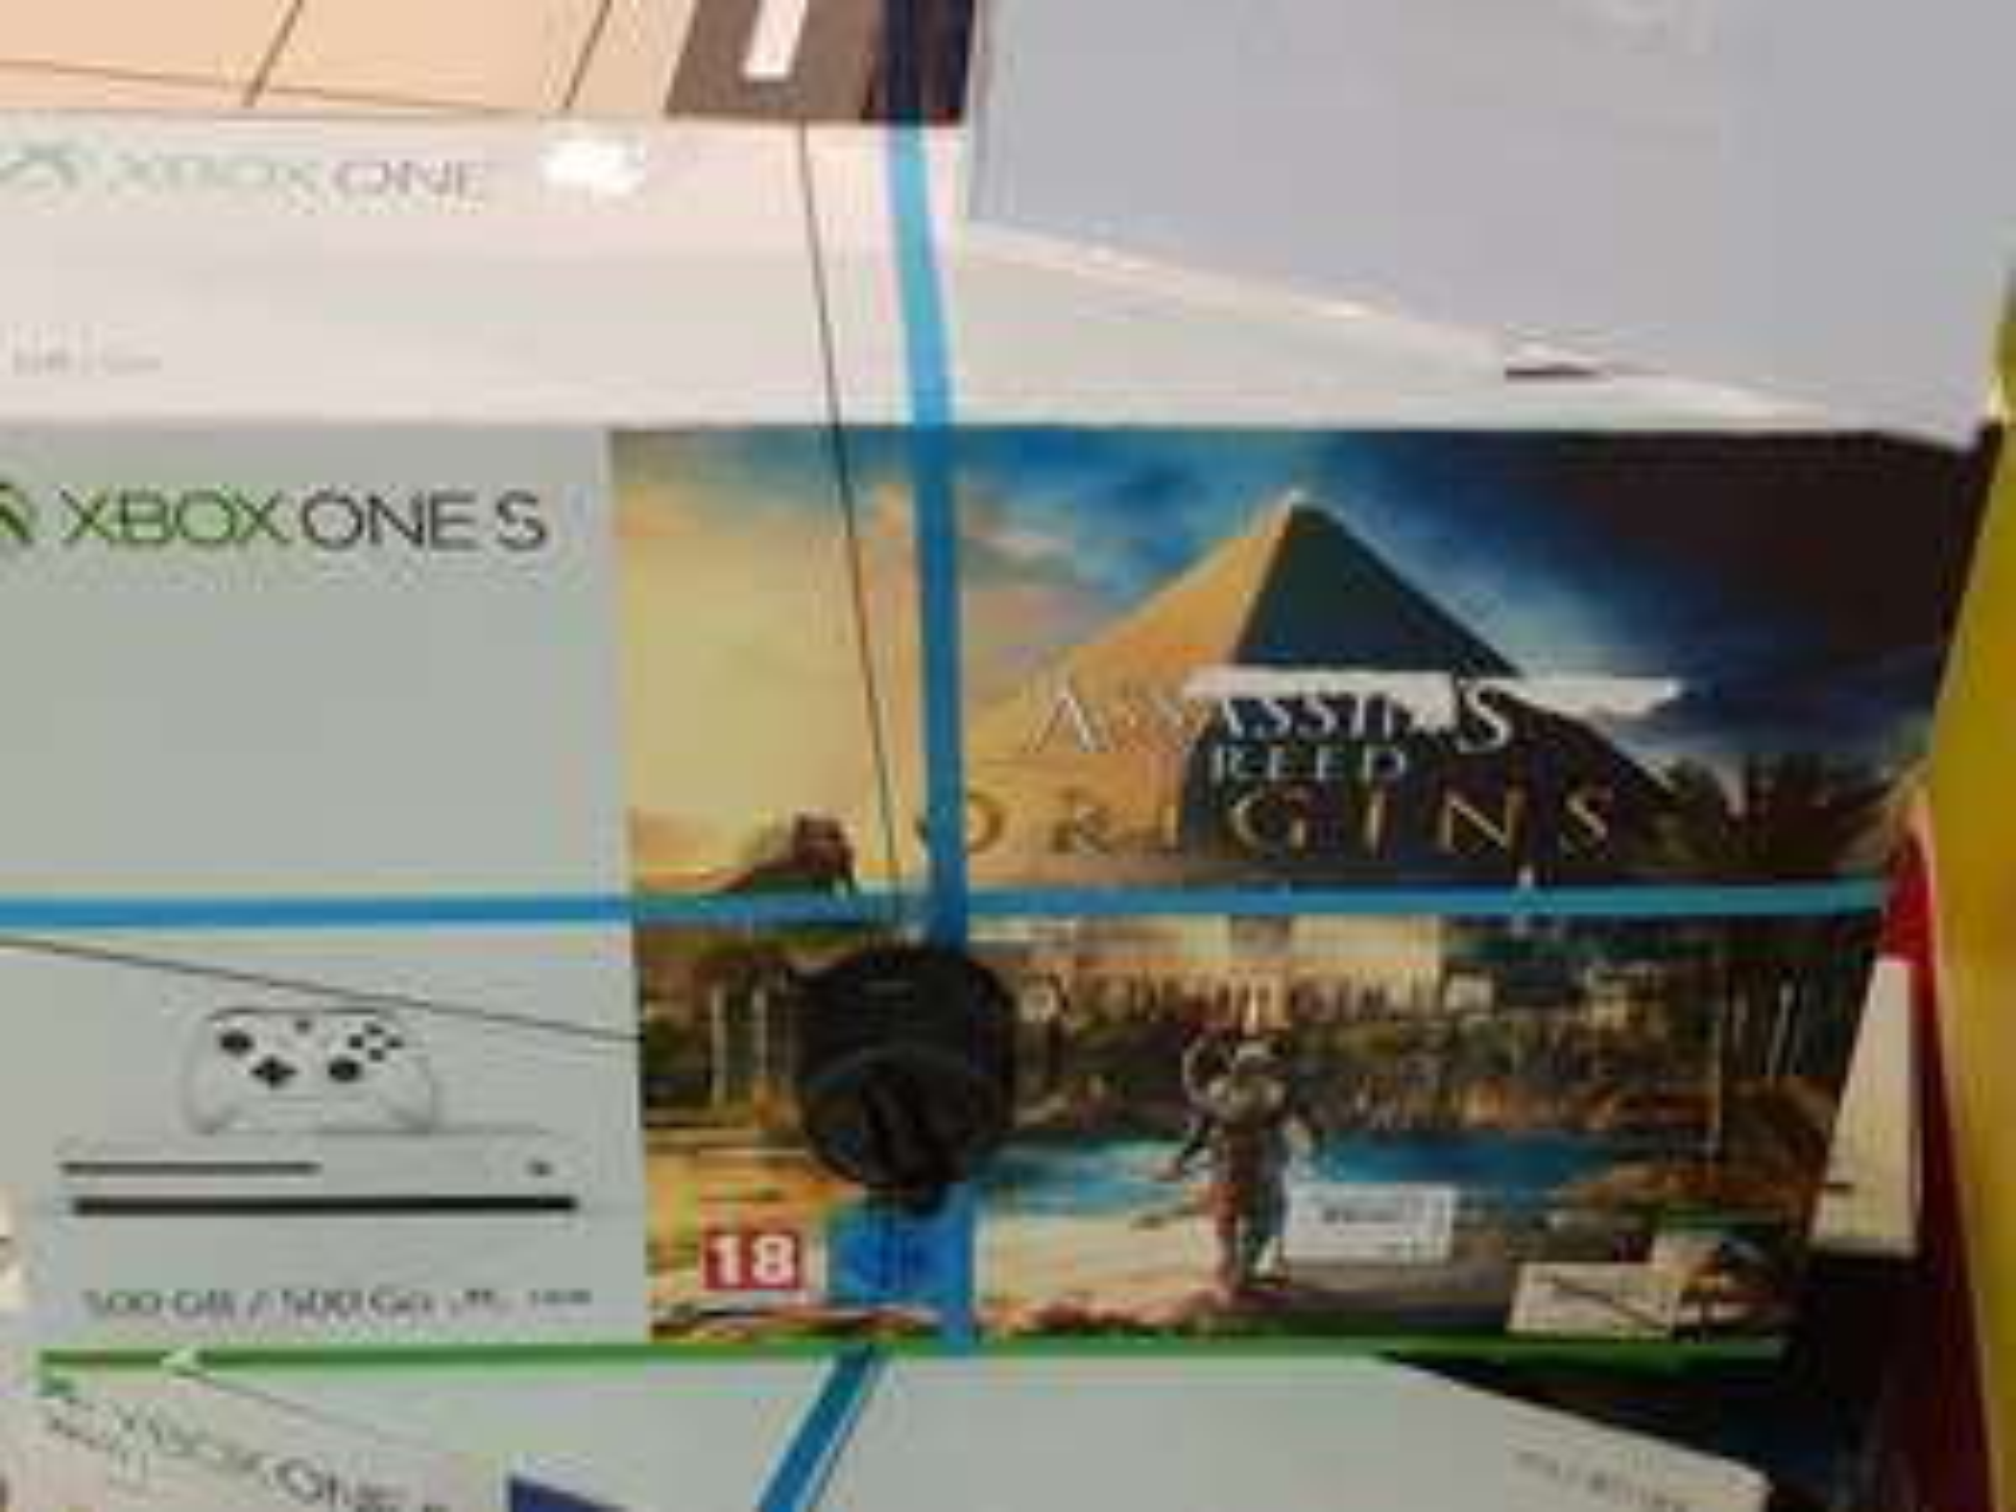 Console Microsoft Xbox One S 500go + Assassin's Creed Origins ou Forza Horizon 3 - Fleury les Aubrais (45)